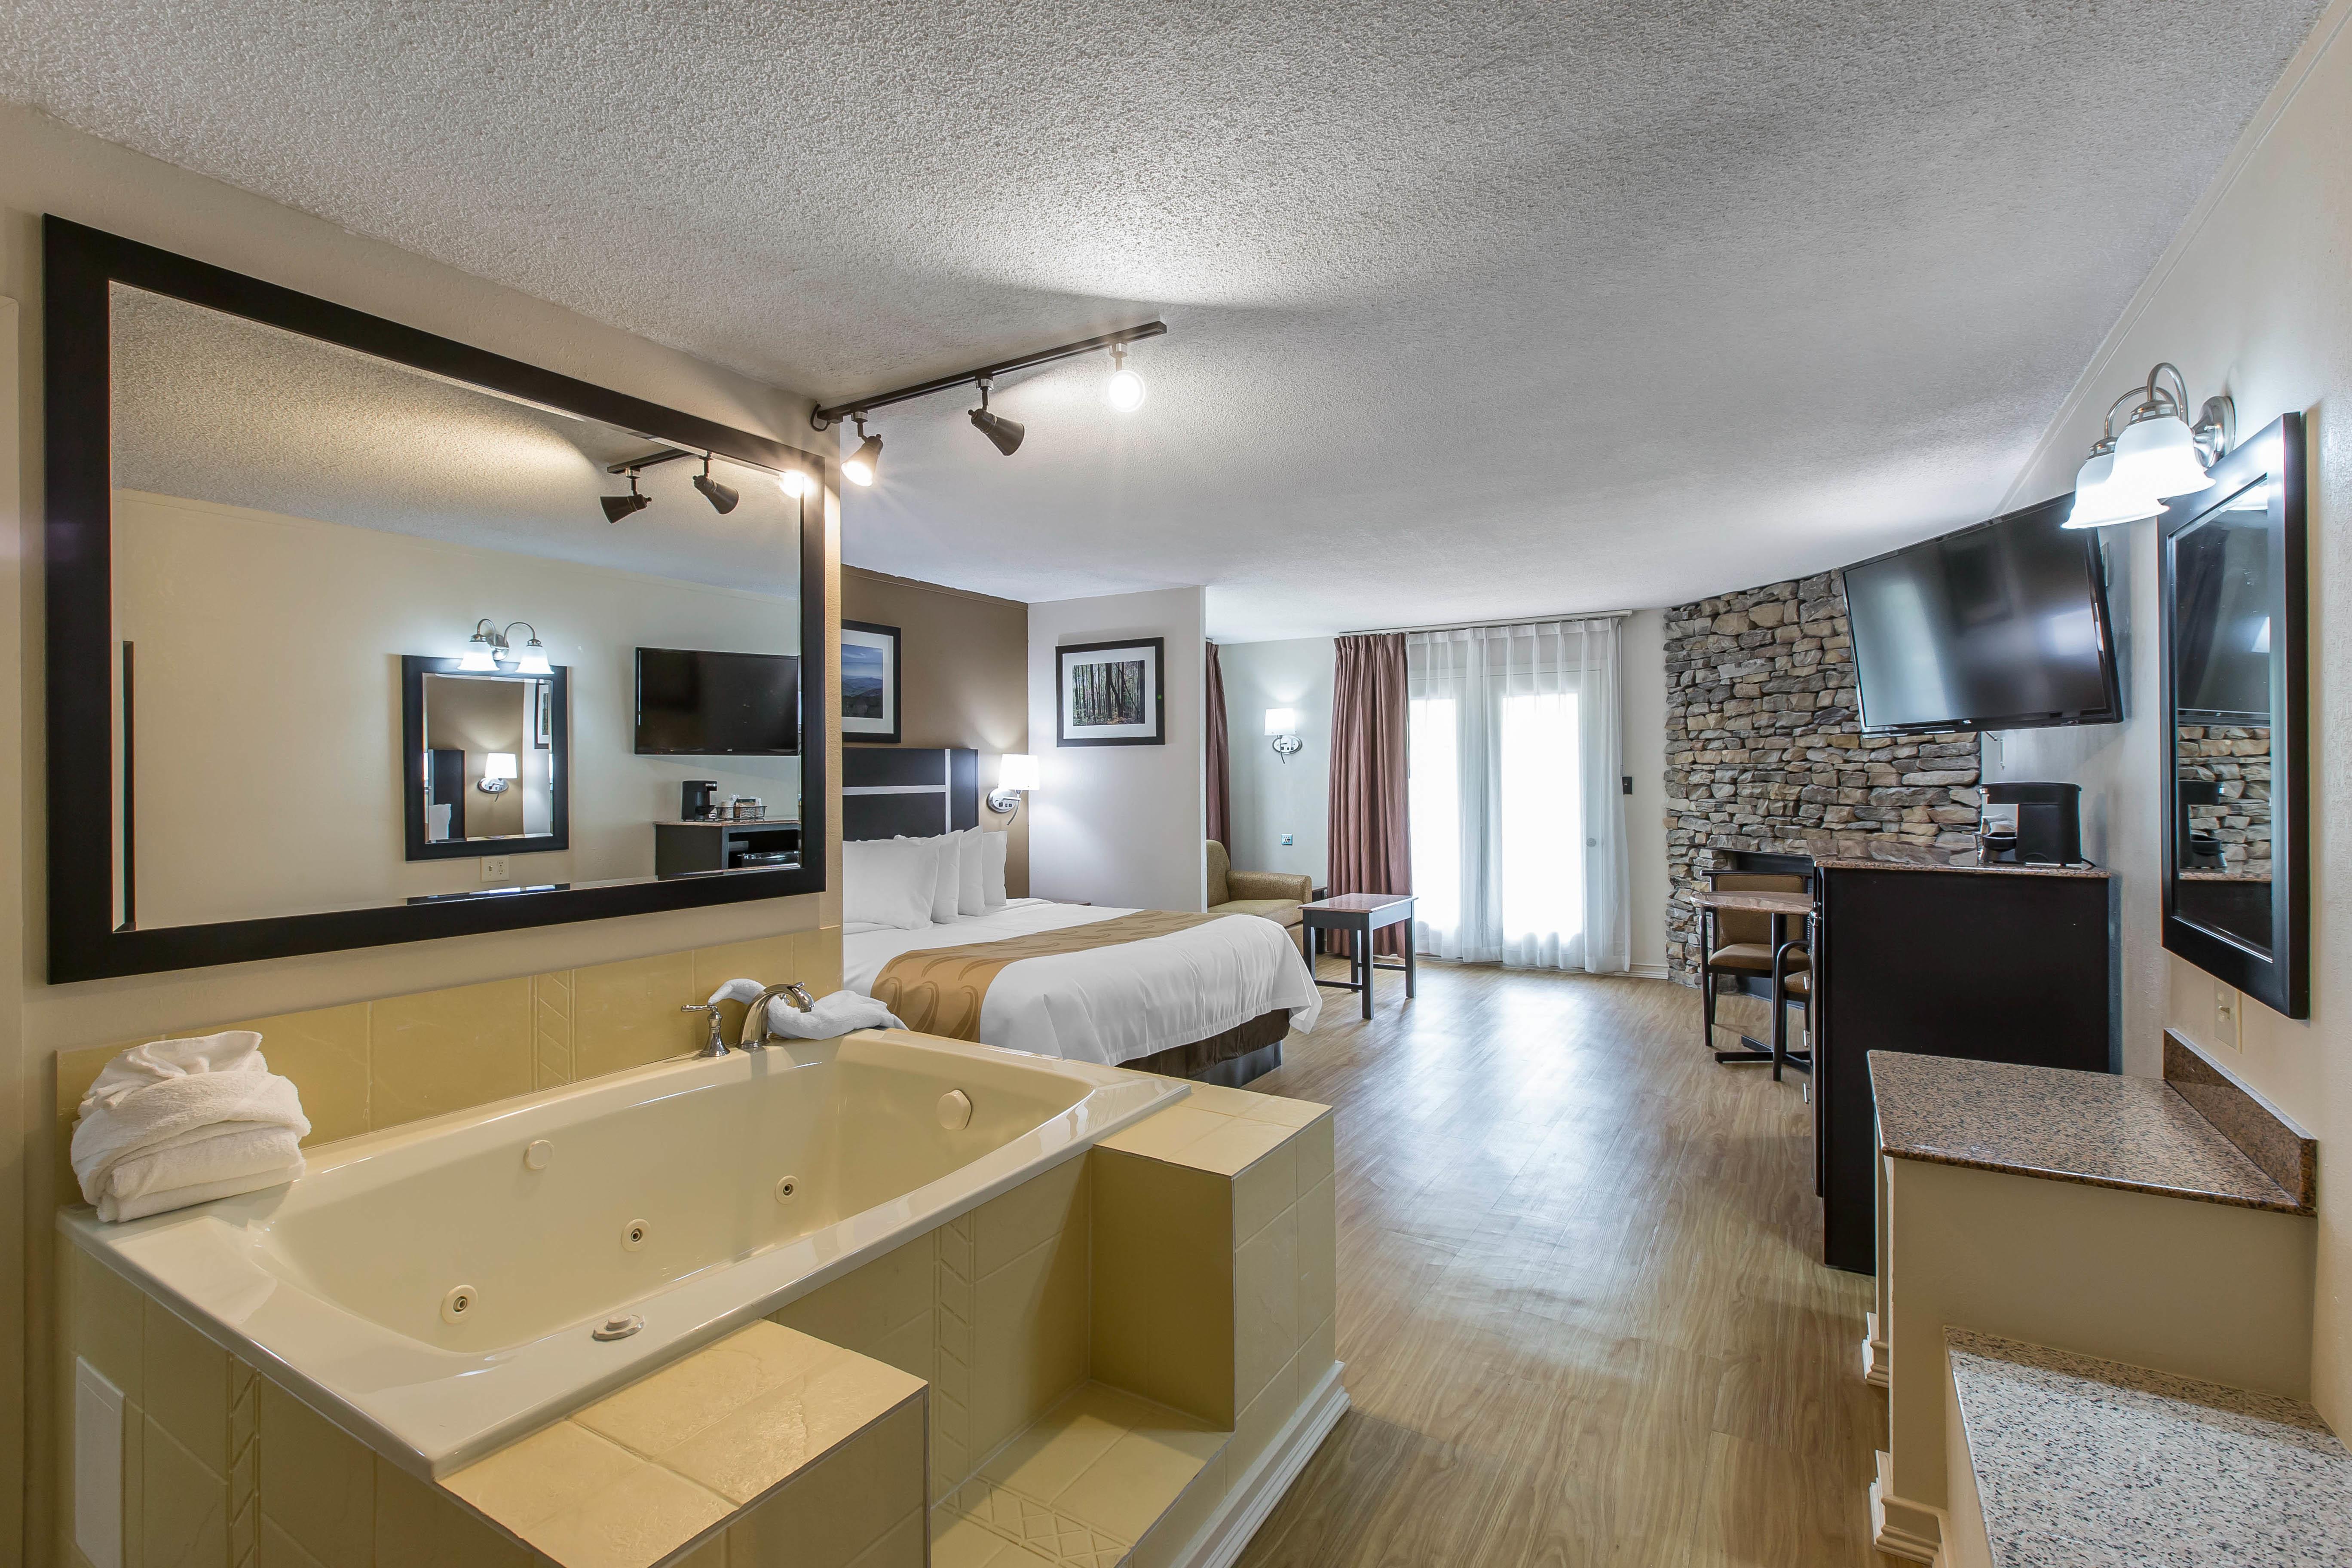 Quality Inn Suites At 401 Hemlock St Gatlinburg Tn On Fave